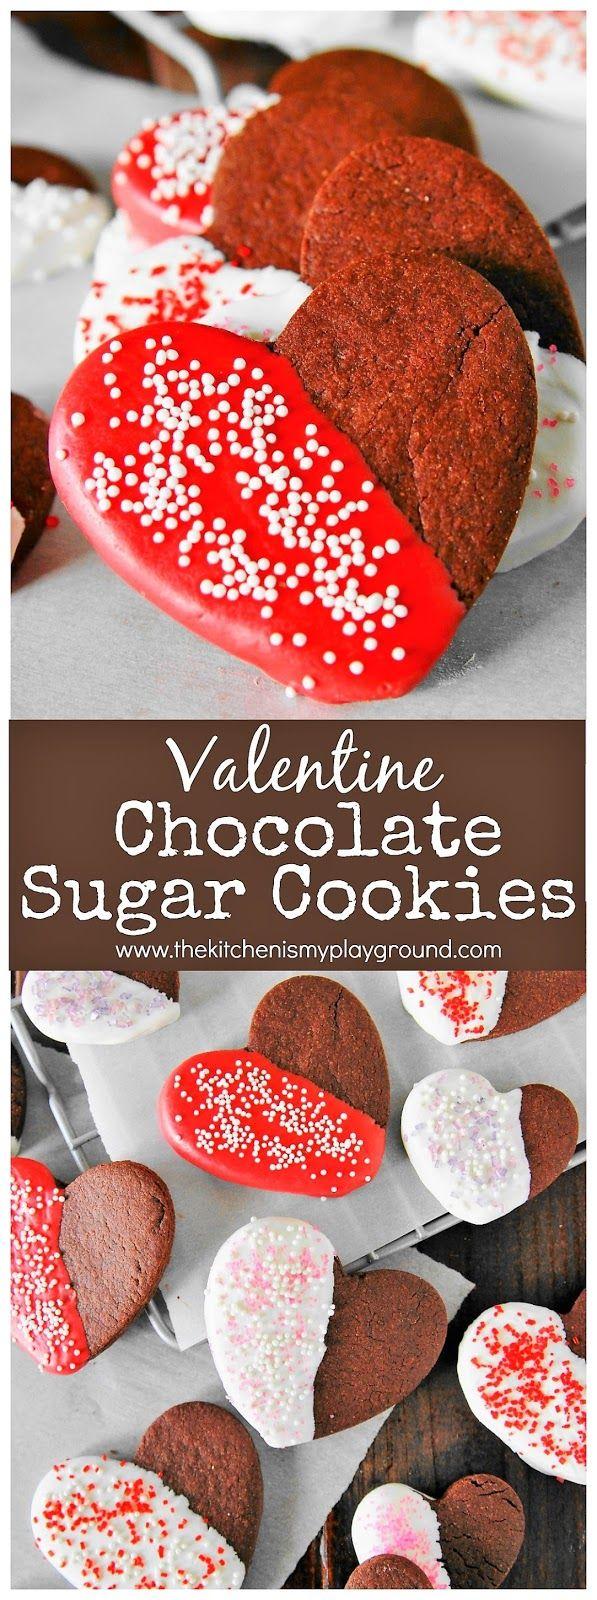 Heart Shaped Valentine Chocolate Sugar Cookies Image